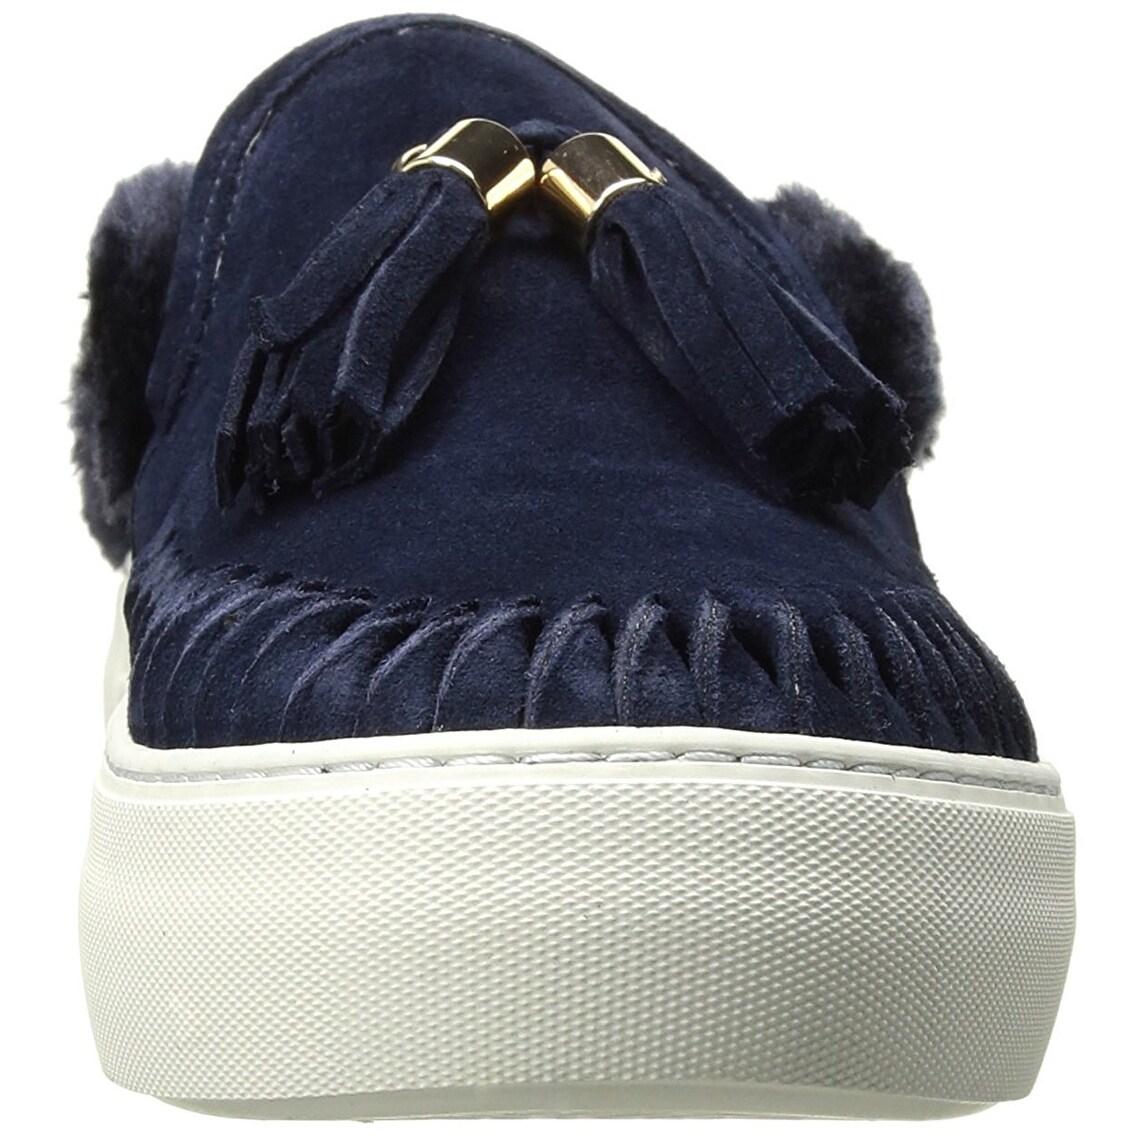 3f7d9997af324 J Slides Womens Azul Low Top Slip On Fashion Sneakers